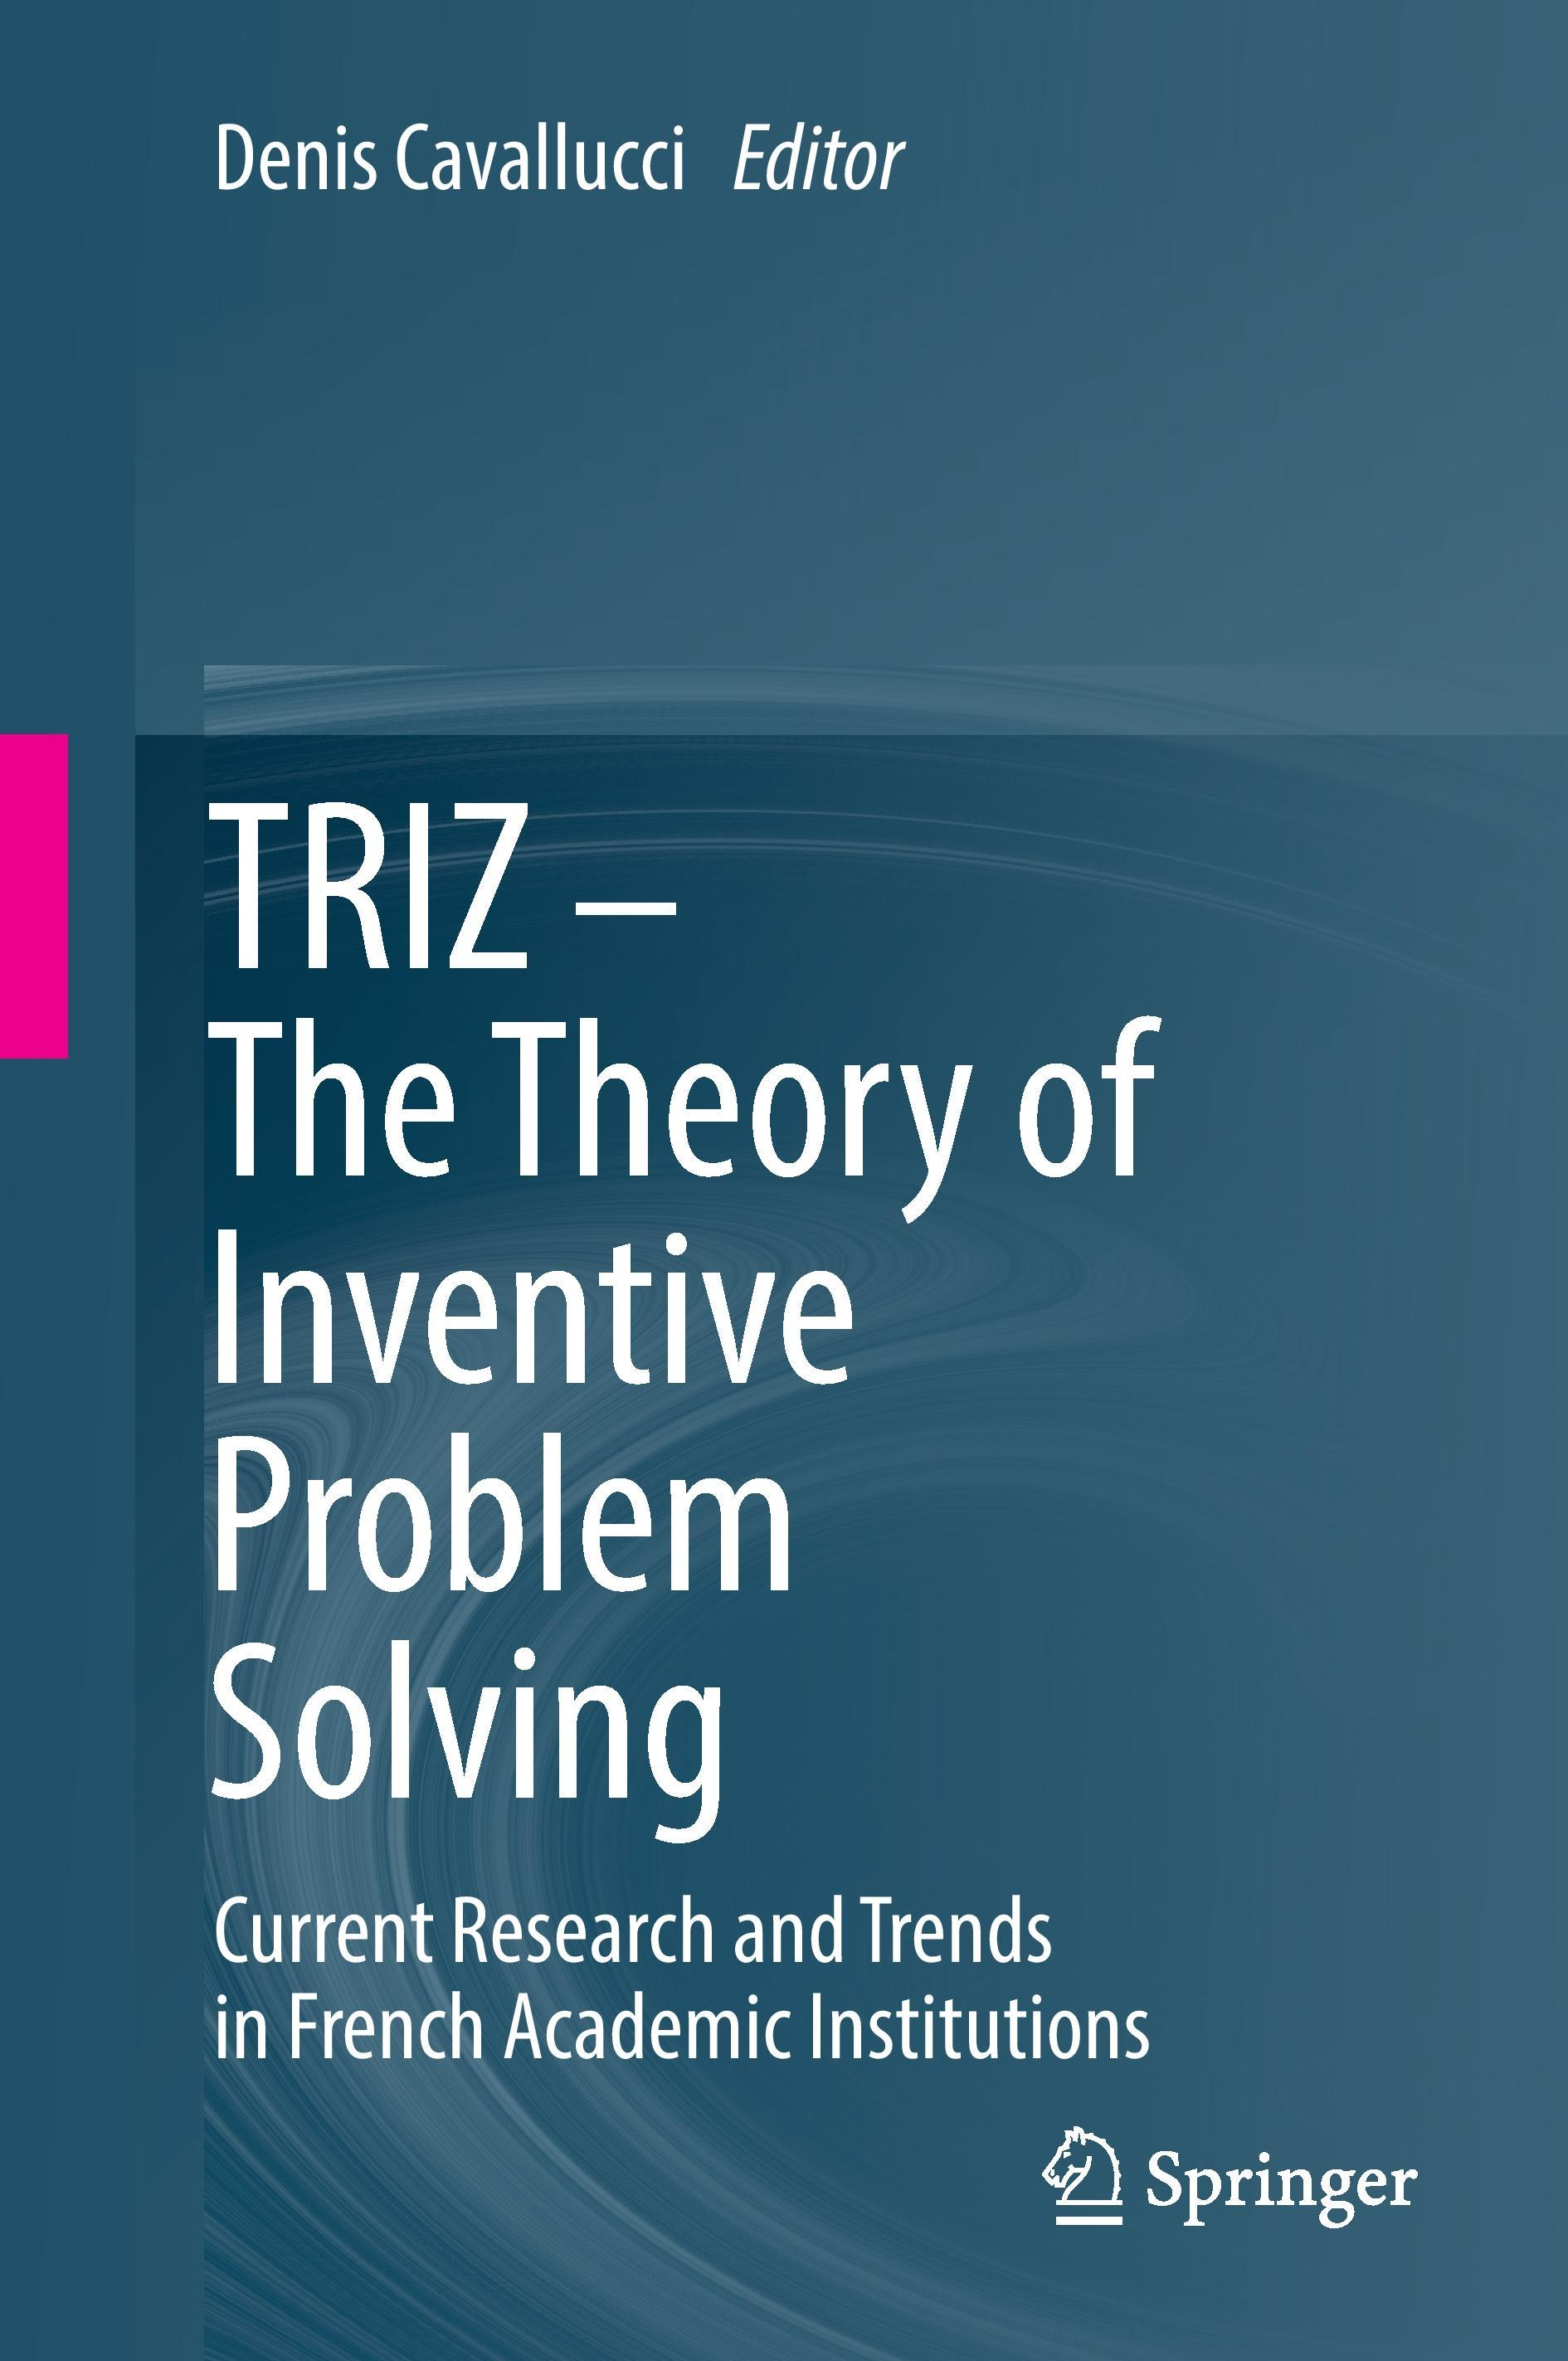 TRIZ - The Theory of Inventive Problem Solving Denis Cavallucci